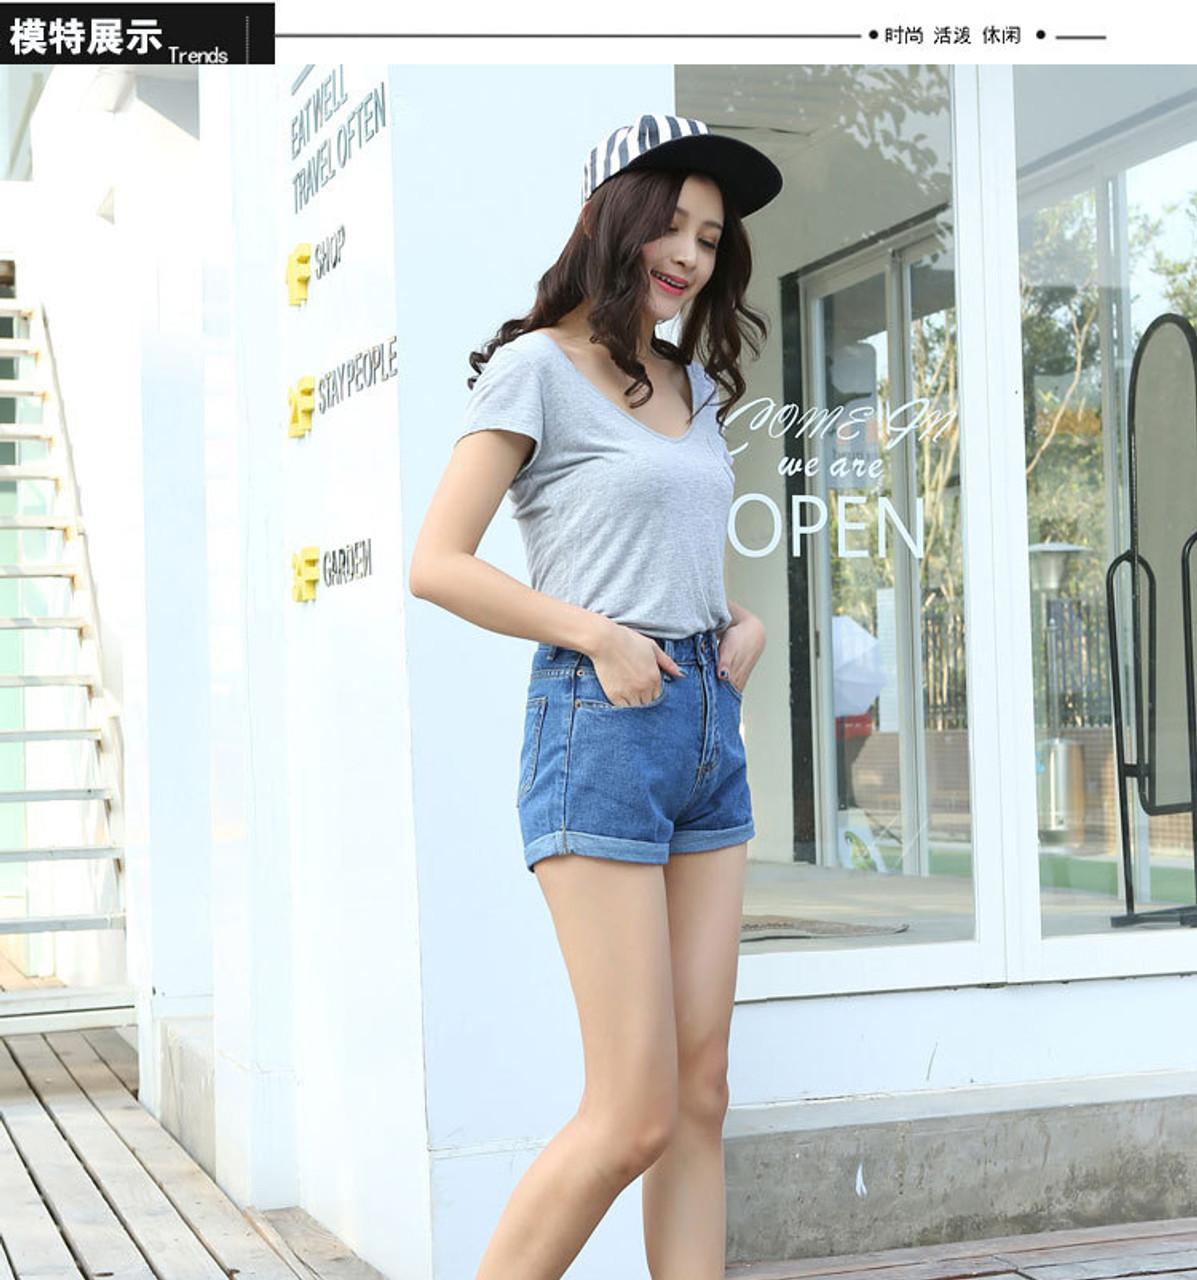 697b9e1367d ... Casual 2016 New Korean Style Summer Vintage High Waisted Denim Women  Shorts Plus Size Slim Stretch ...